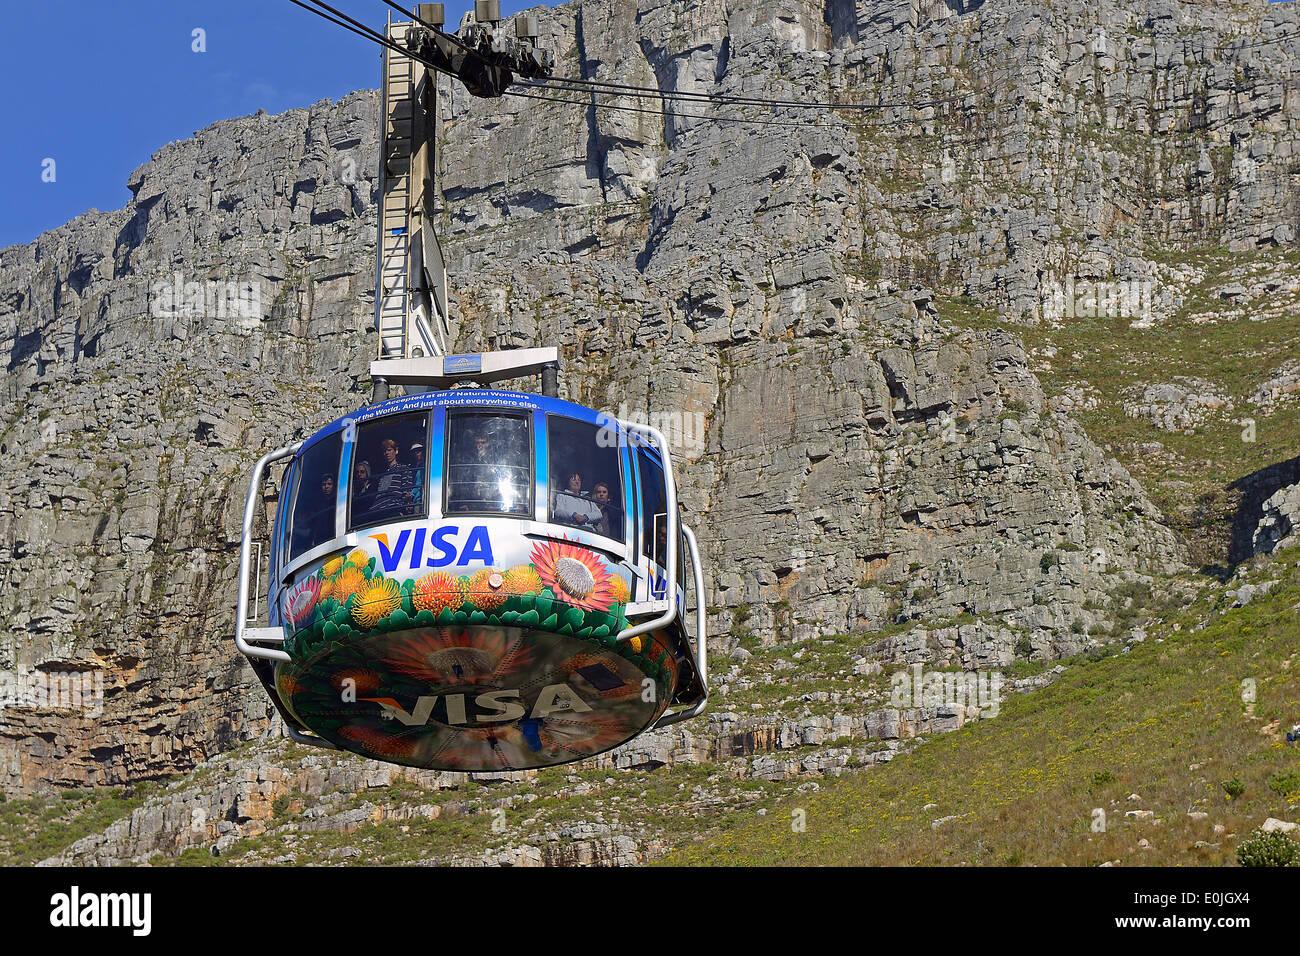 Gondel der Seilbahn zum Tafelberg, Kapstadt, West Kap, Western Cape, Suedafrika, Afrika - Stock Image